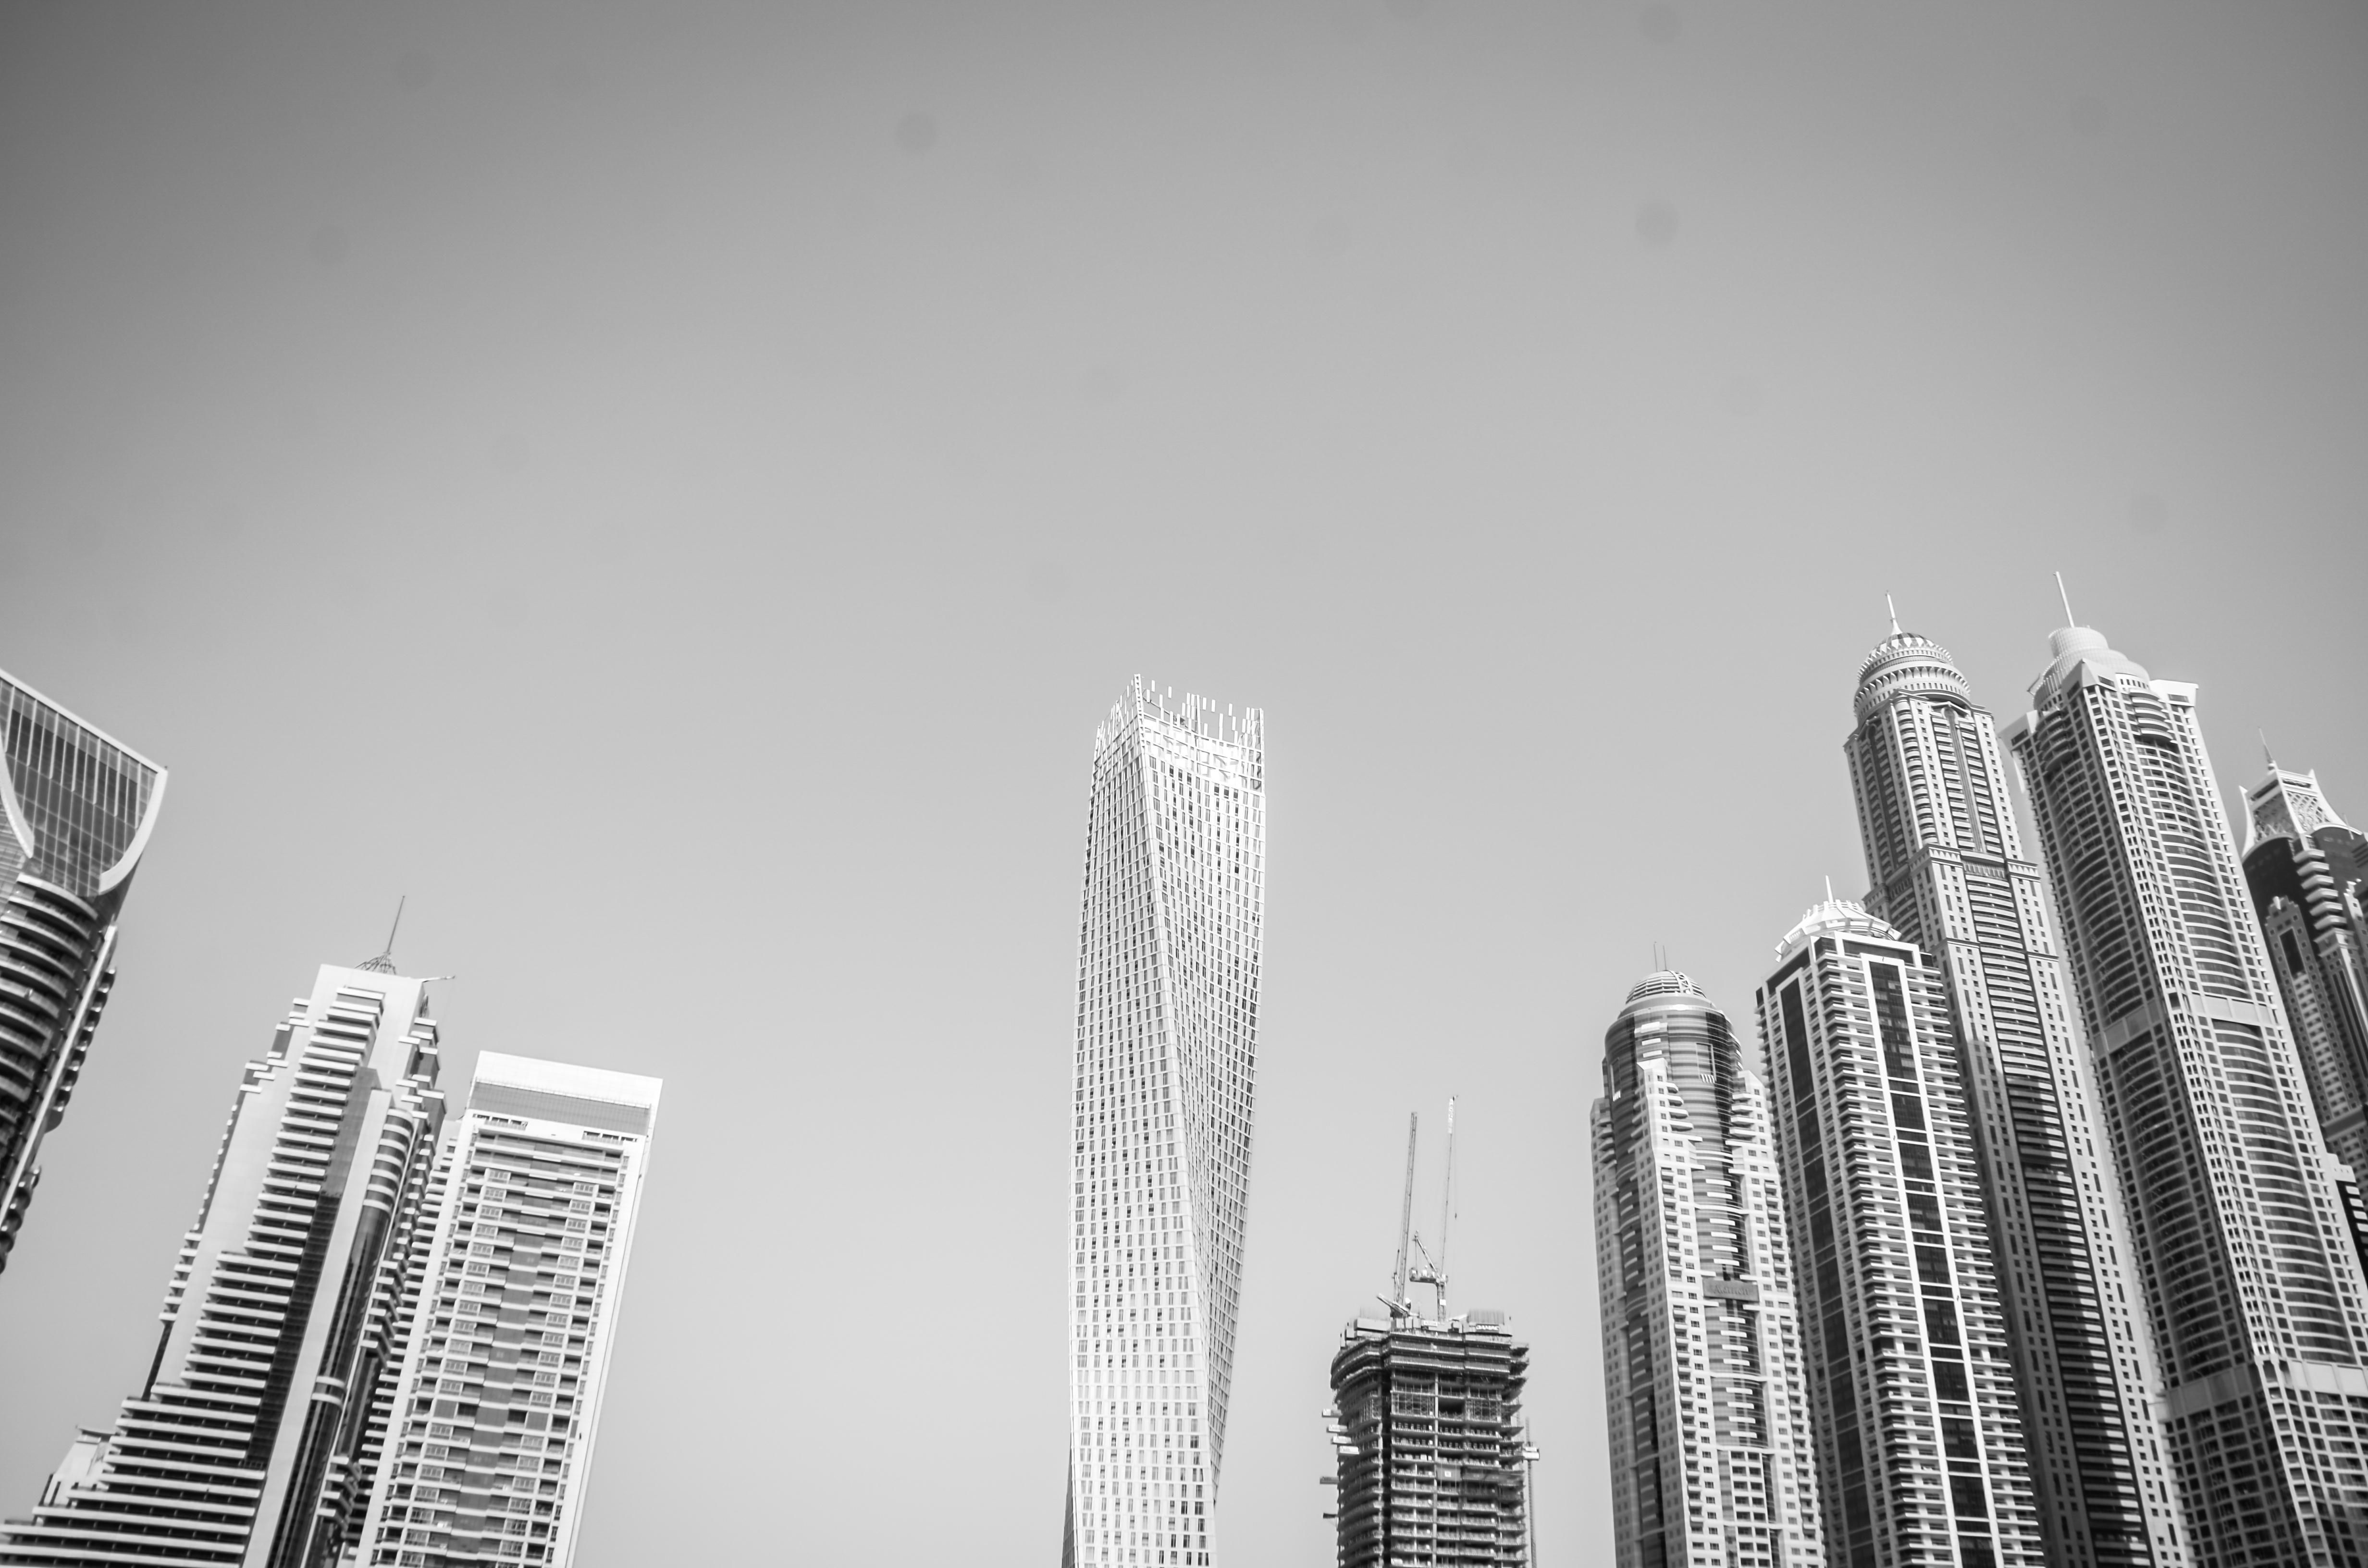 Dubai Impression 1 by loptix